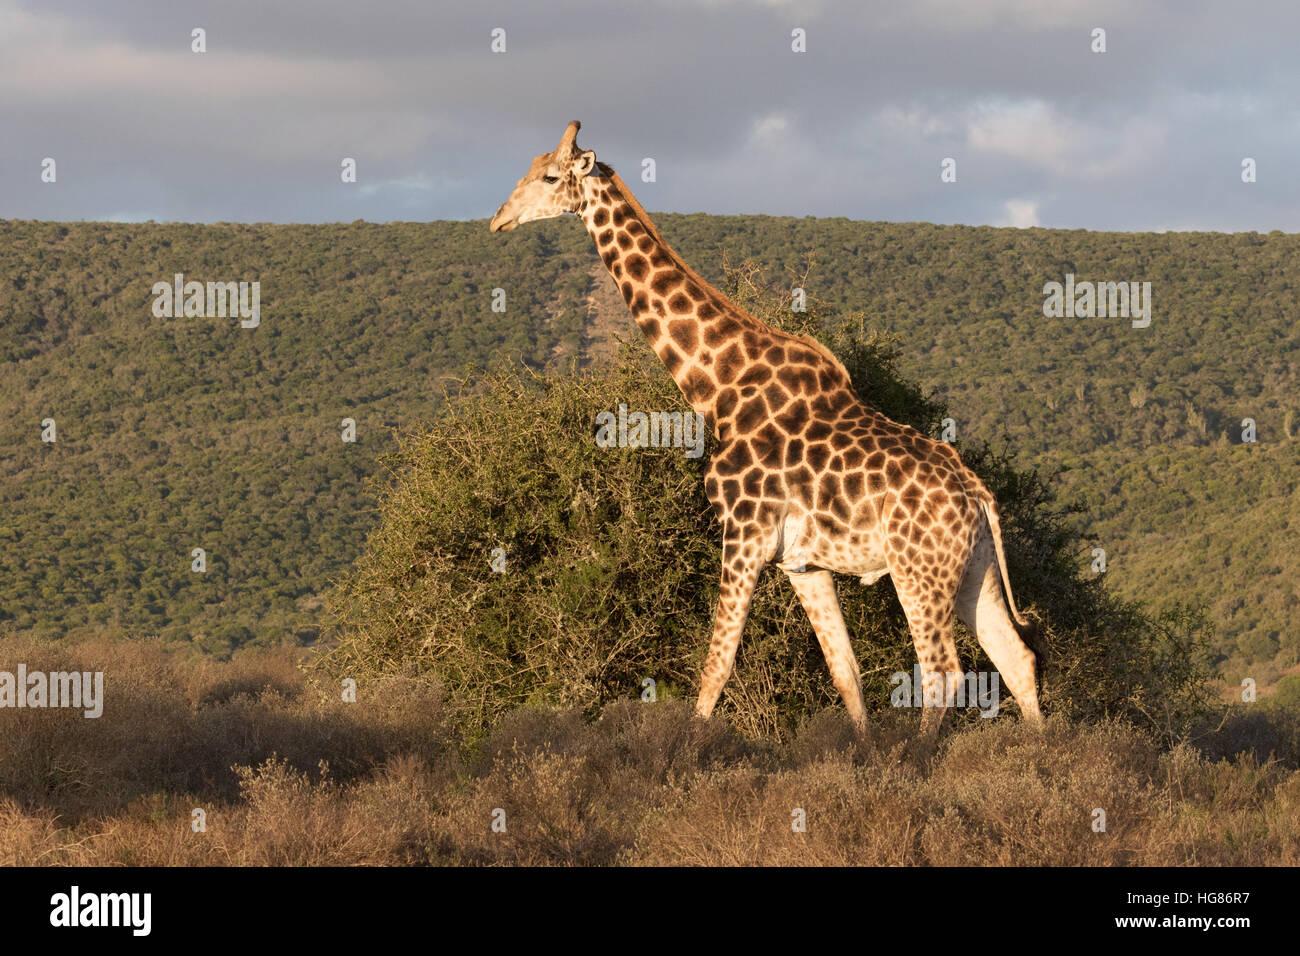 Wild Giraffe adulti ( Southern Giraffe, Giraffa giraffa), Sud Africa Immagini Stock